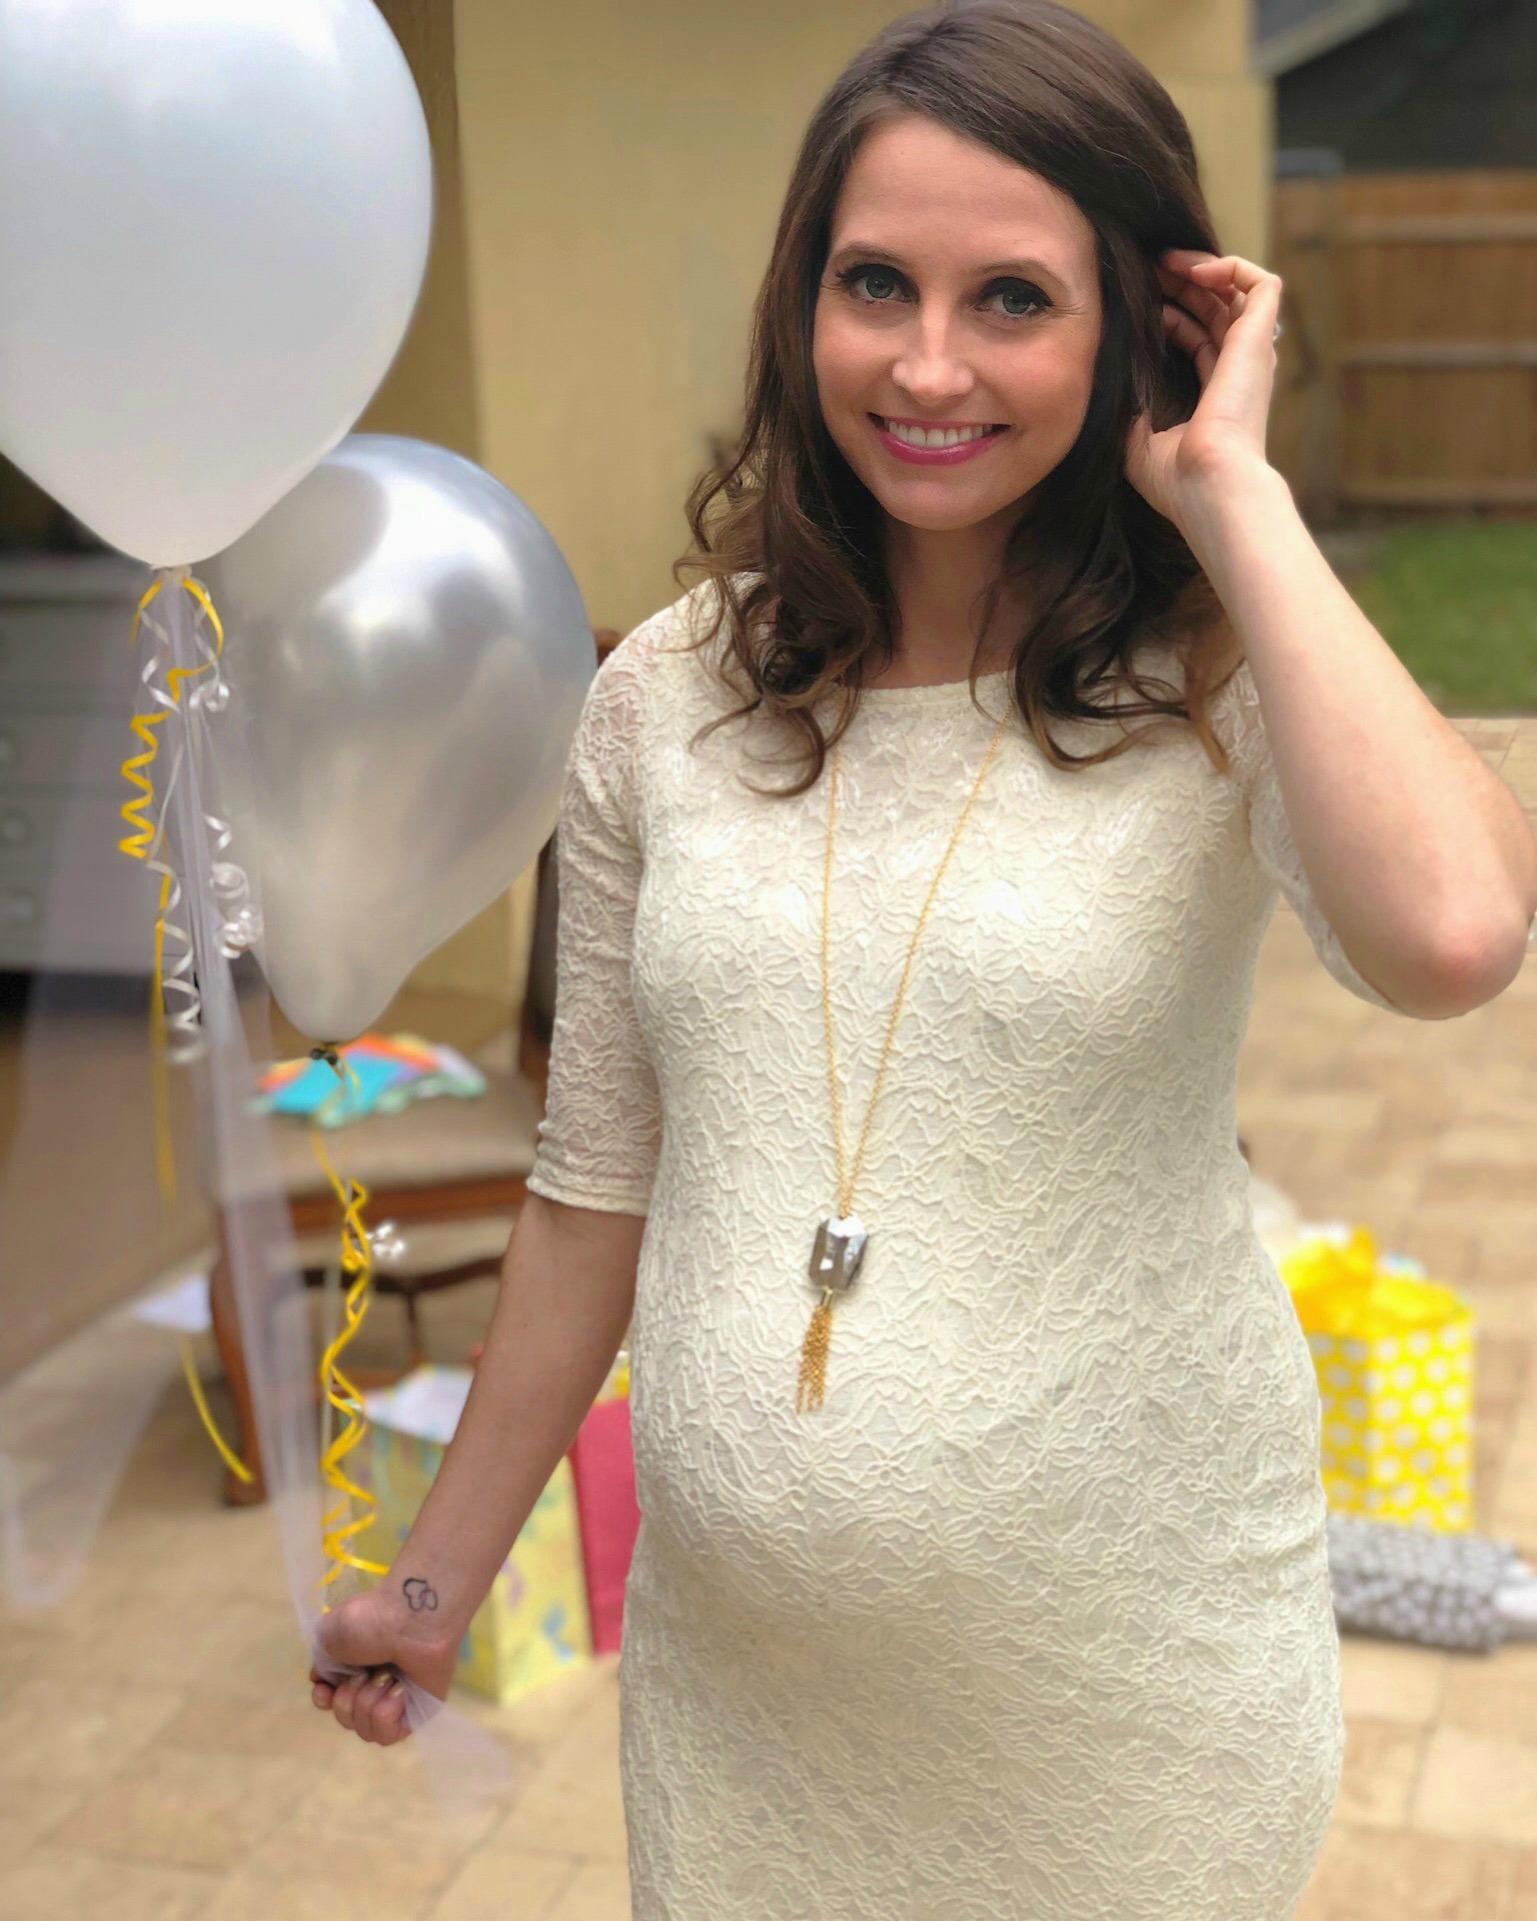 heather at baby shower pink blush maternity dress